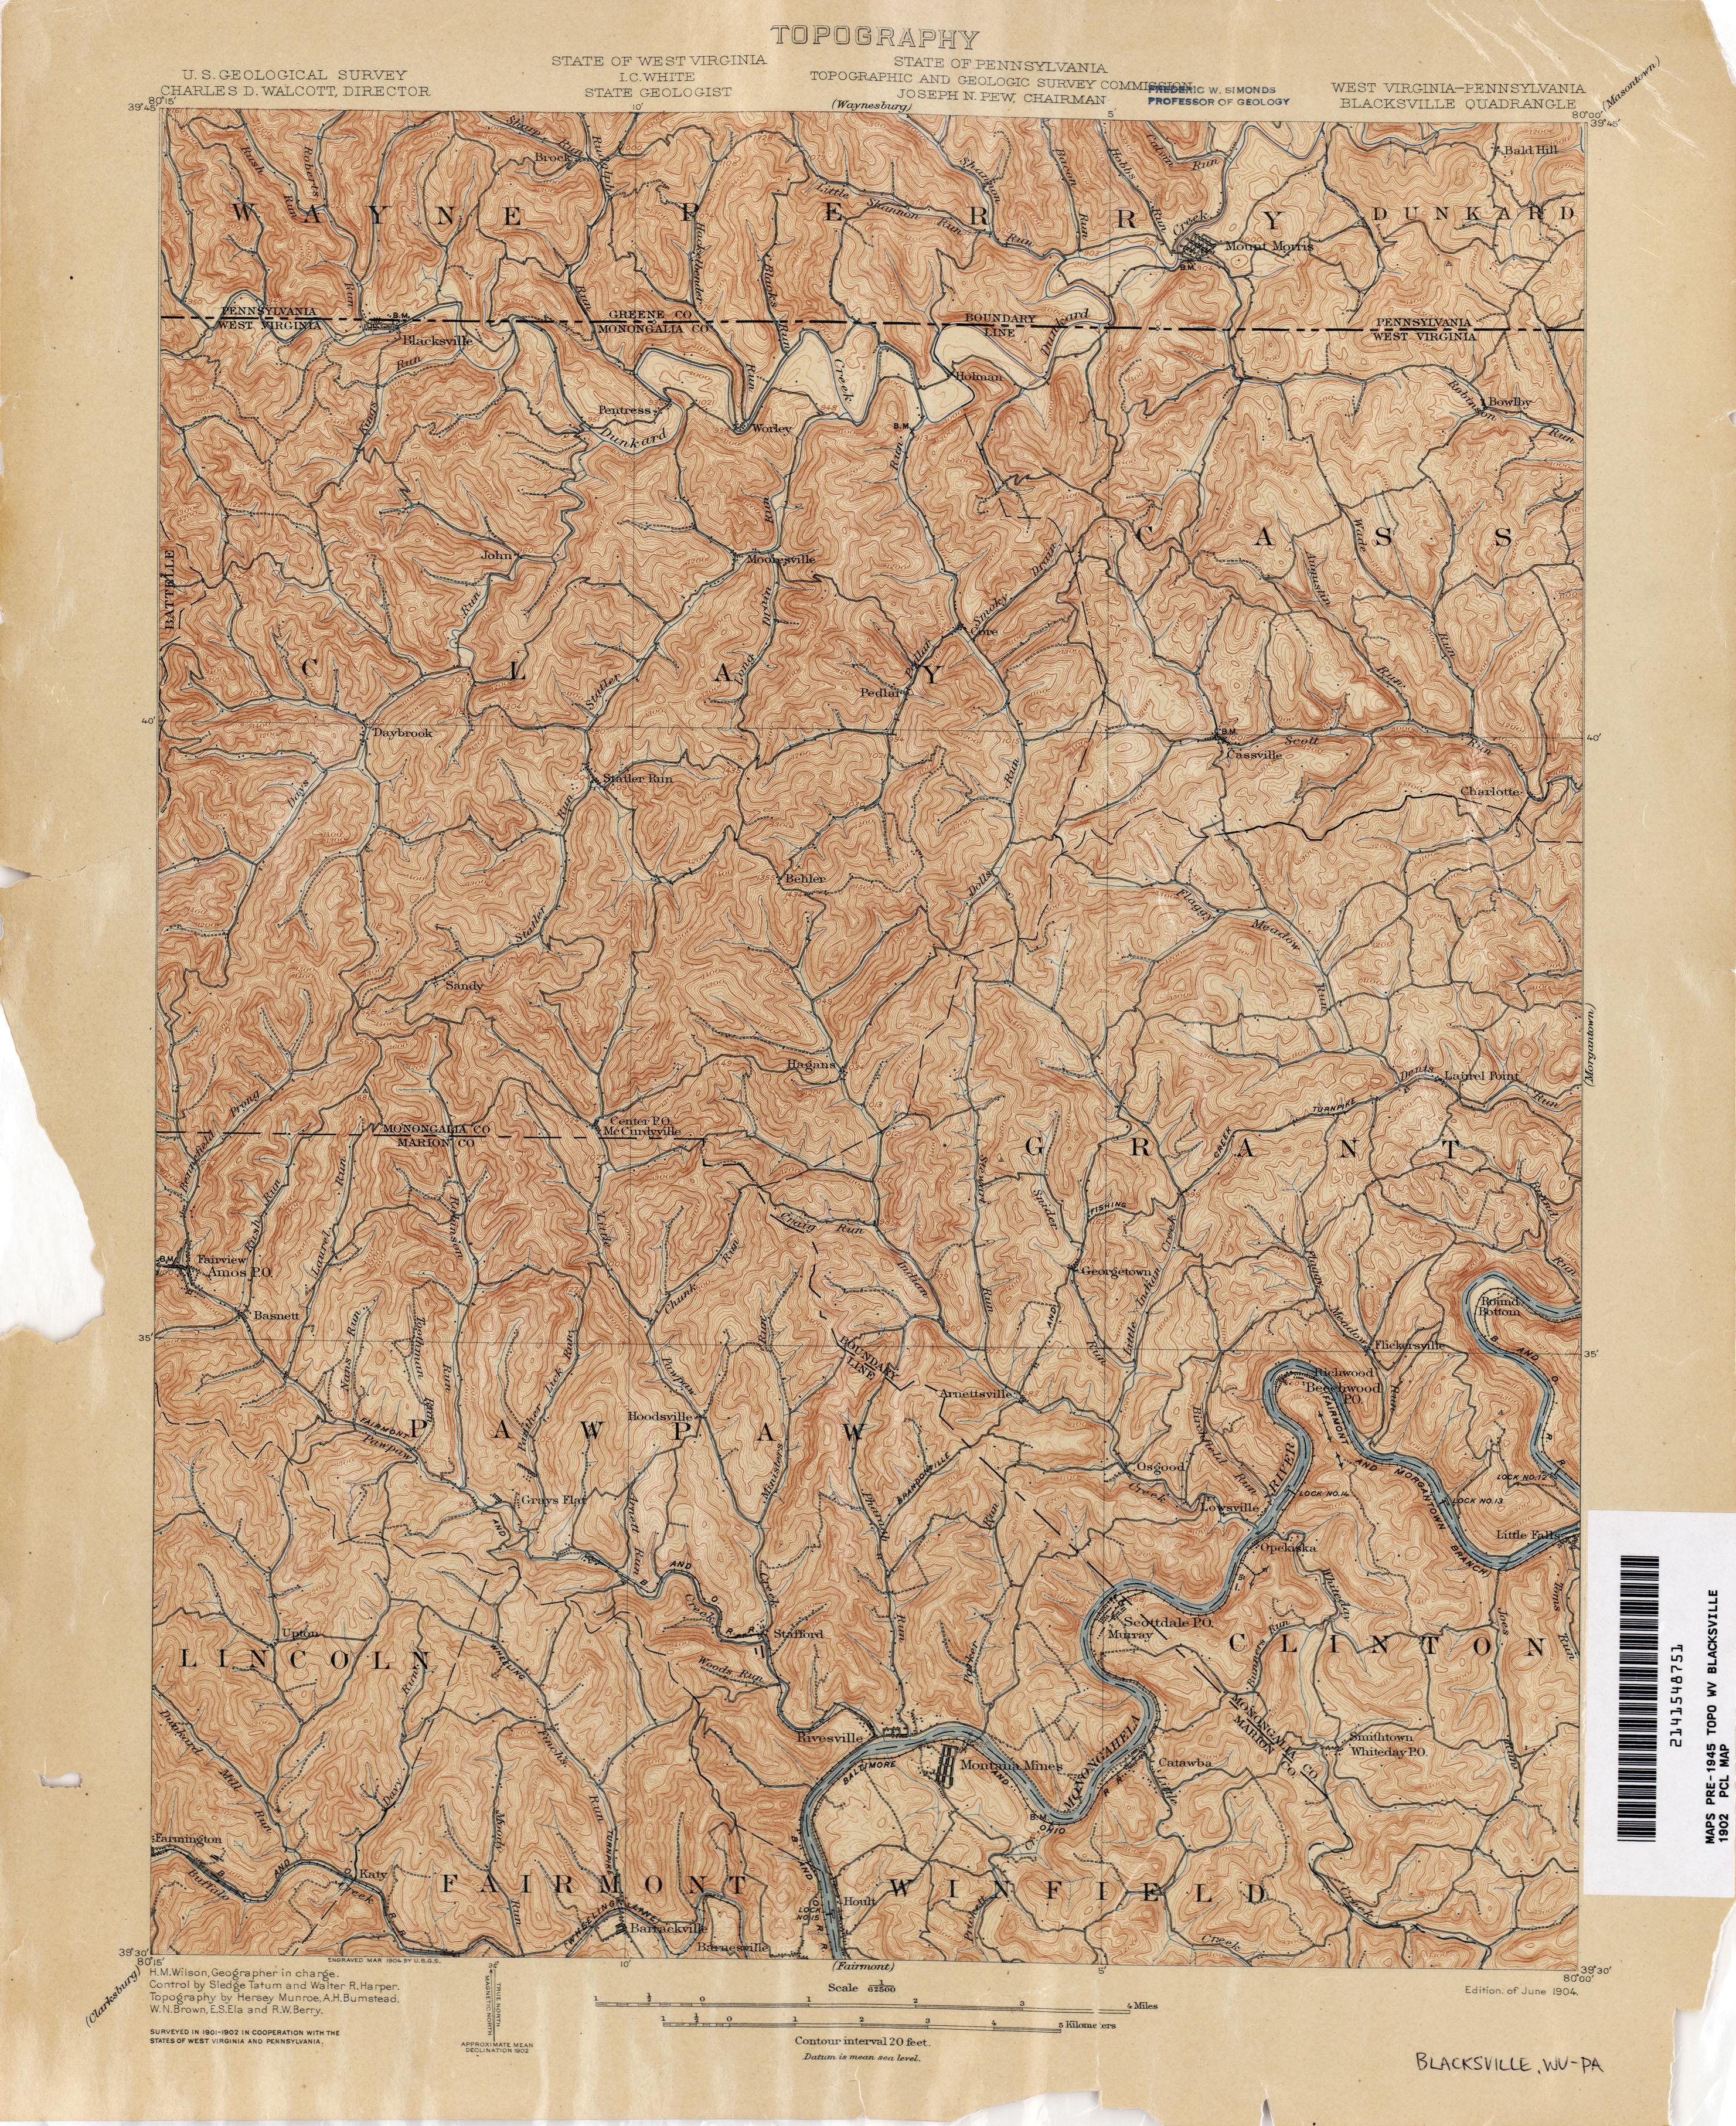 Pennsylvania Virginia Map.Pennsylvania Historical Topographic Maps Perry Castaneda Map